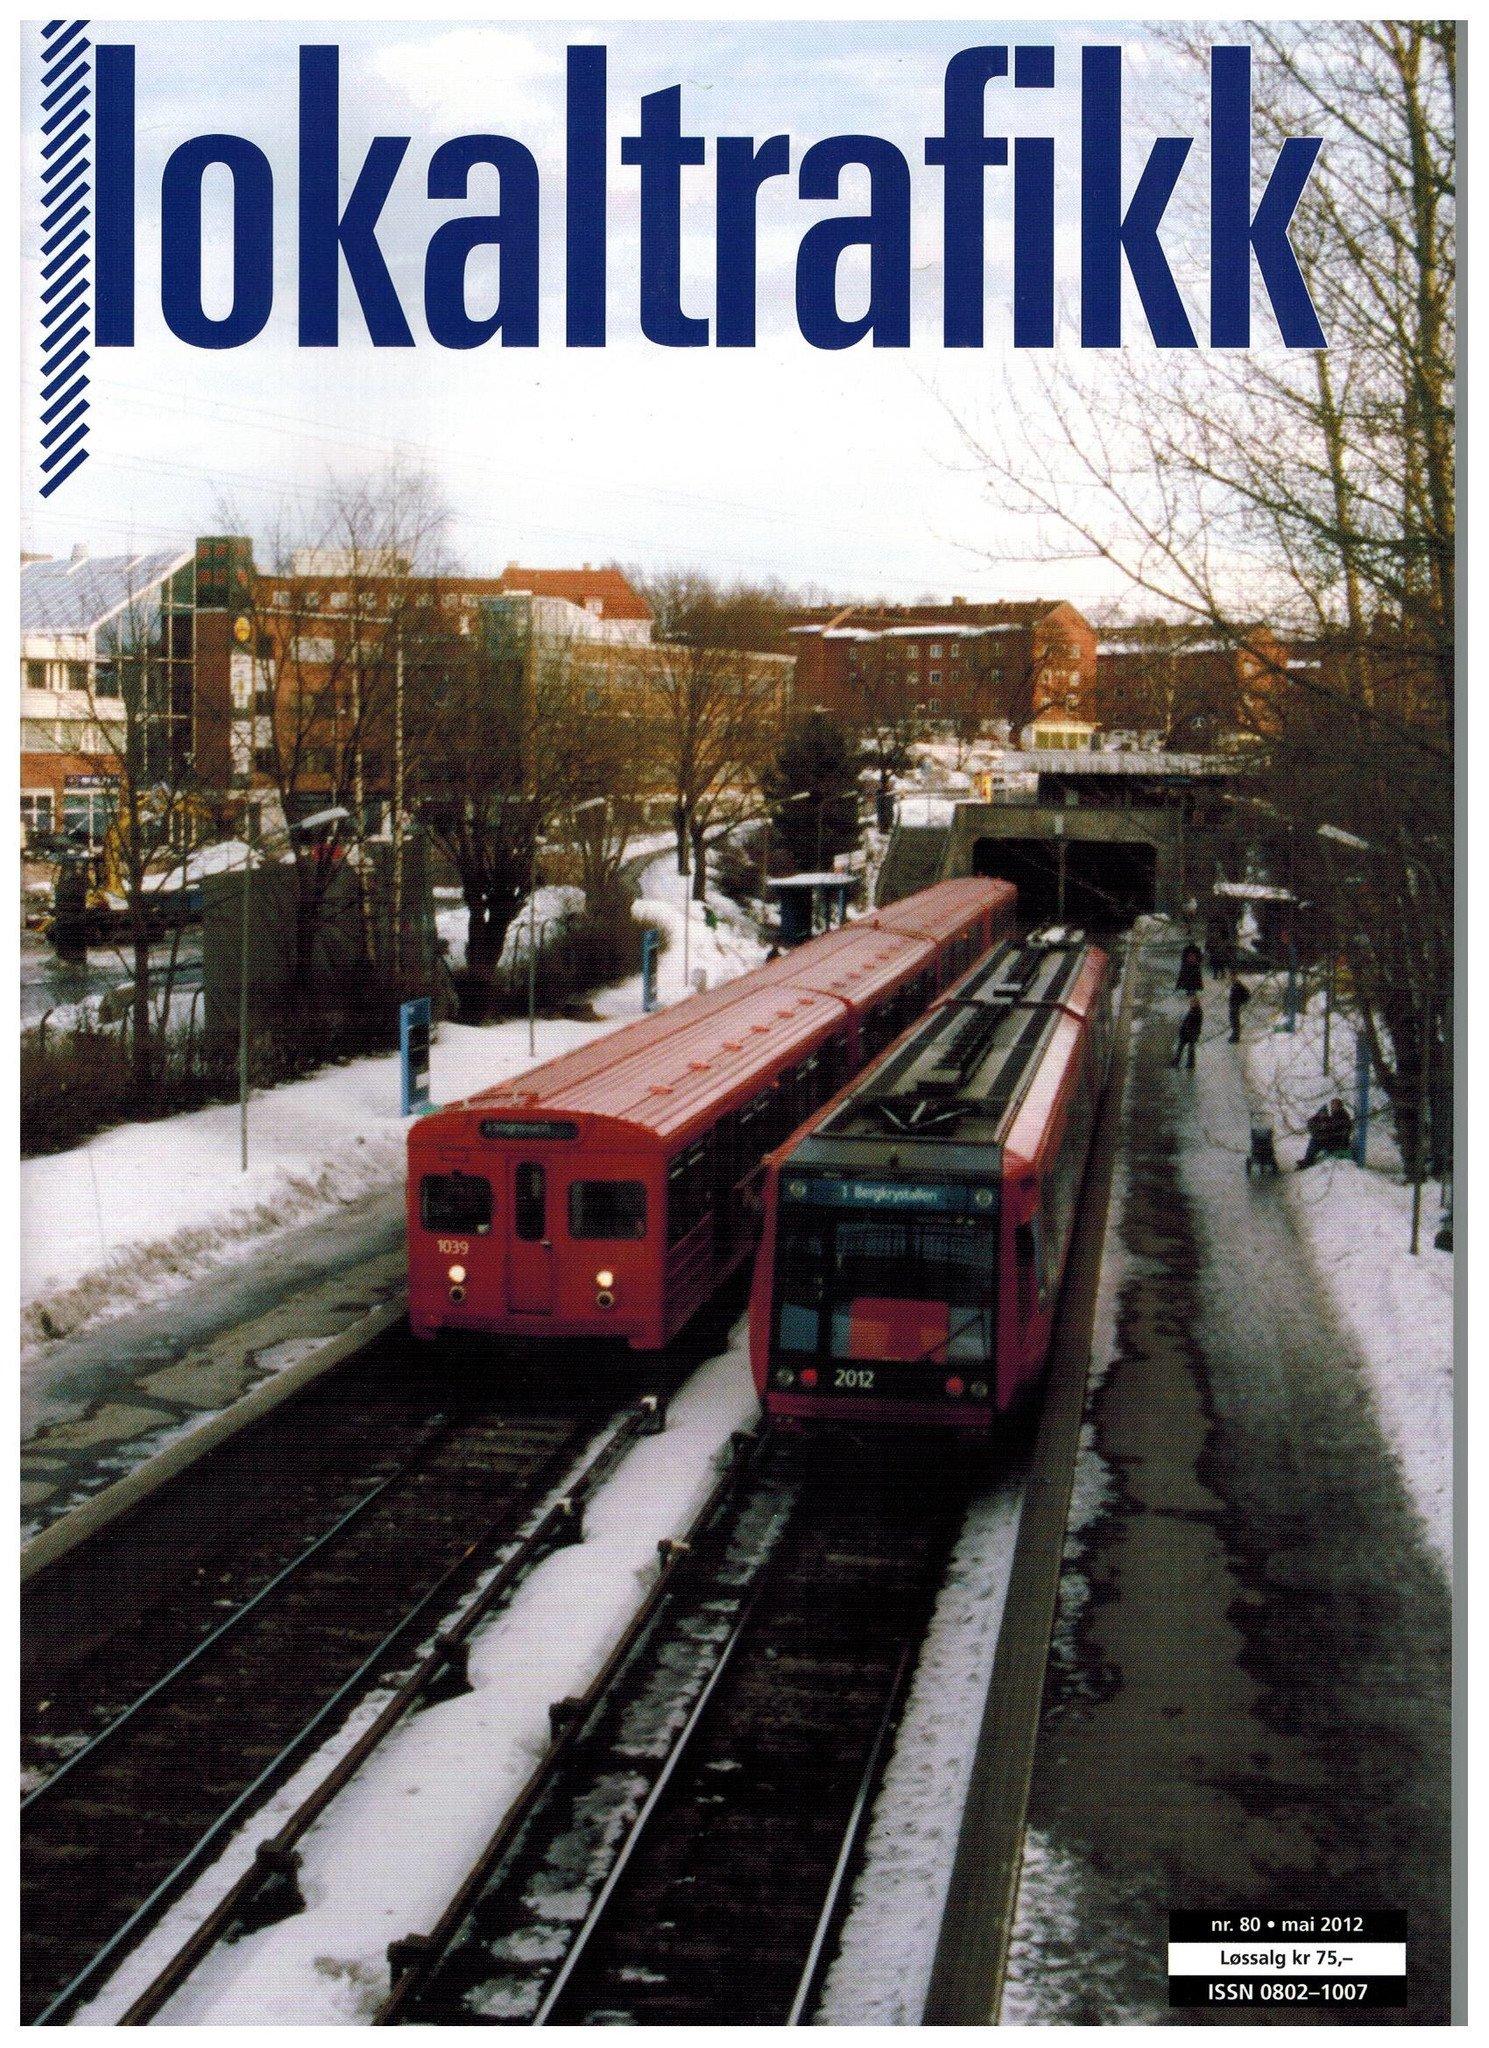 Lokaltrafikk #080